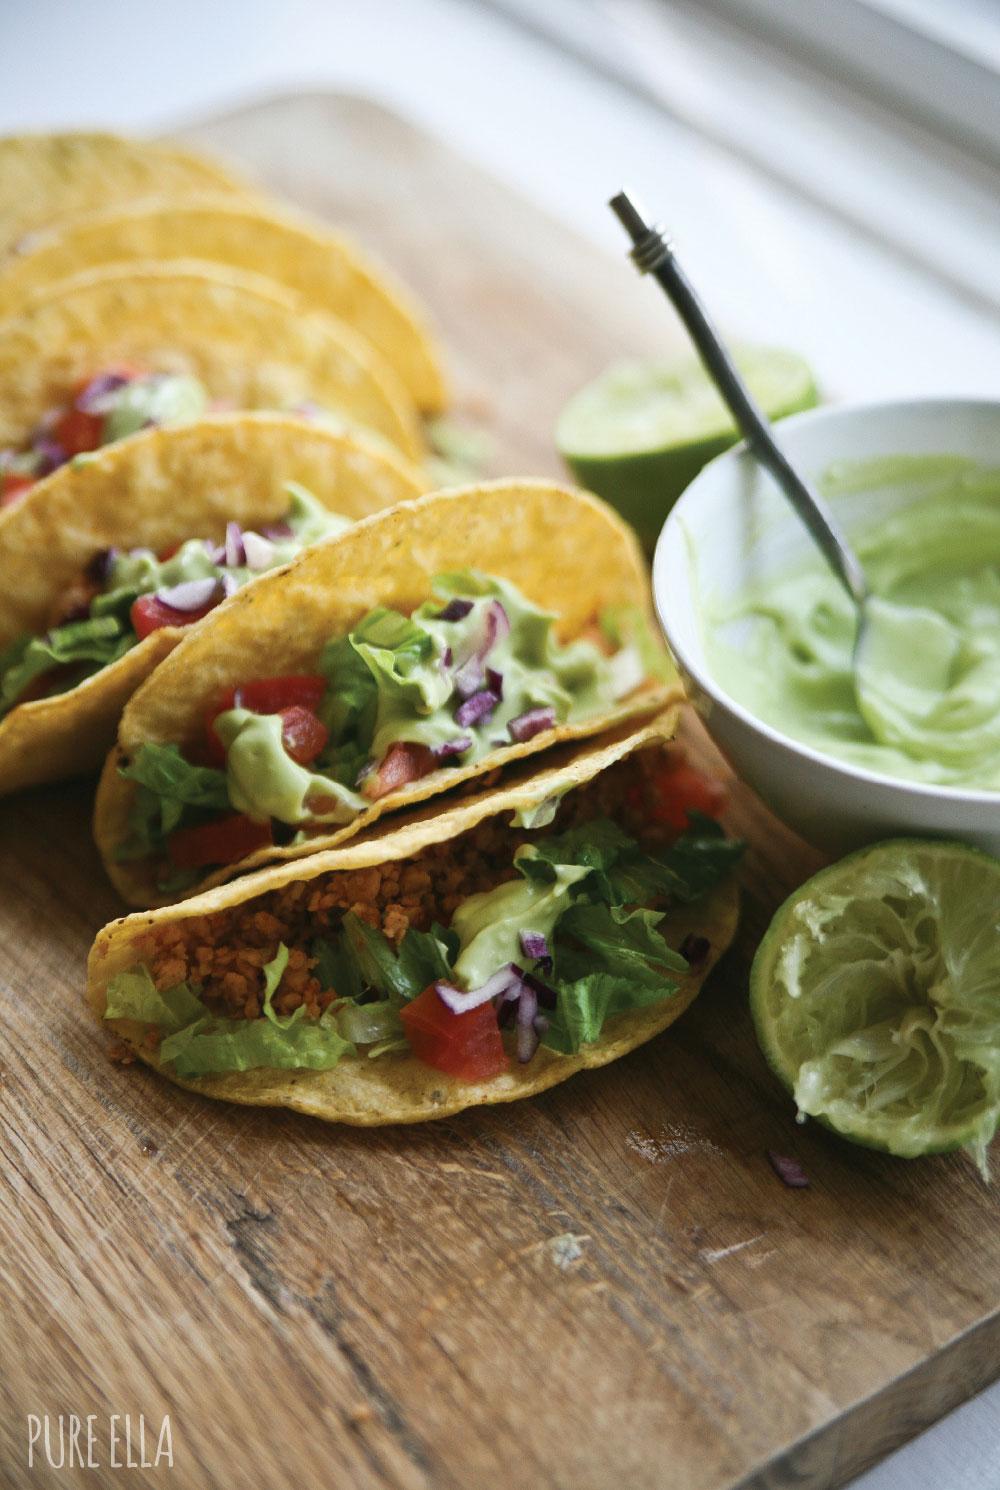 Pure-Ella-gluten-free-and-vegan-Veggie-Protein-Tacos-with-avocado-lime-cream3